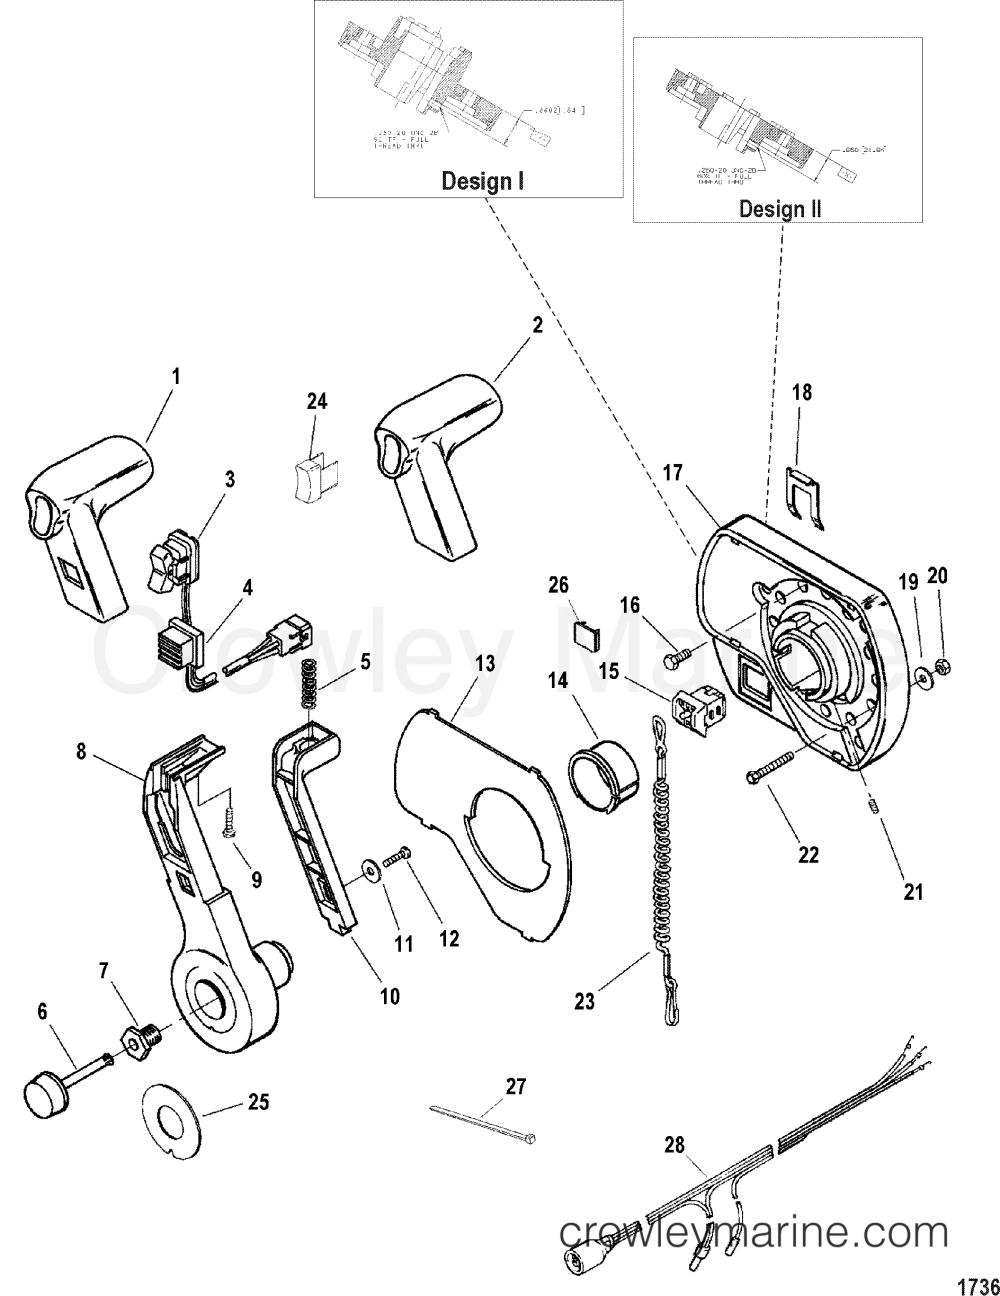 medium resolution of mercury control wiring diagram wiring diagram newmercury throttle wiring diagram wiring diagram used mercury remote control